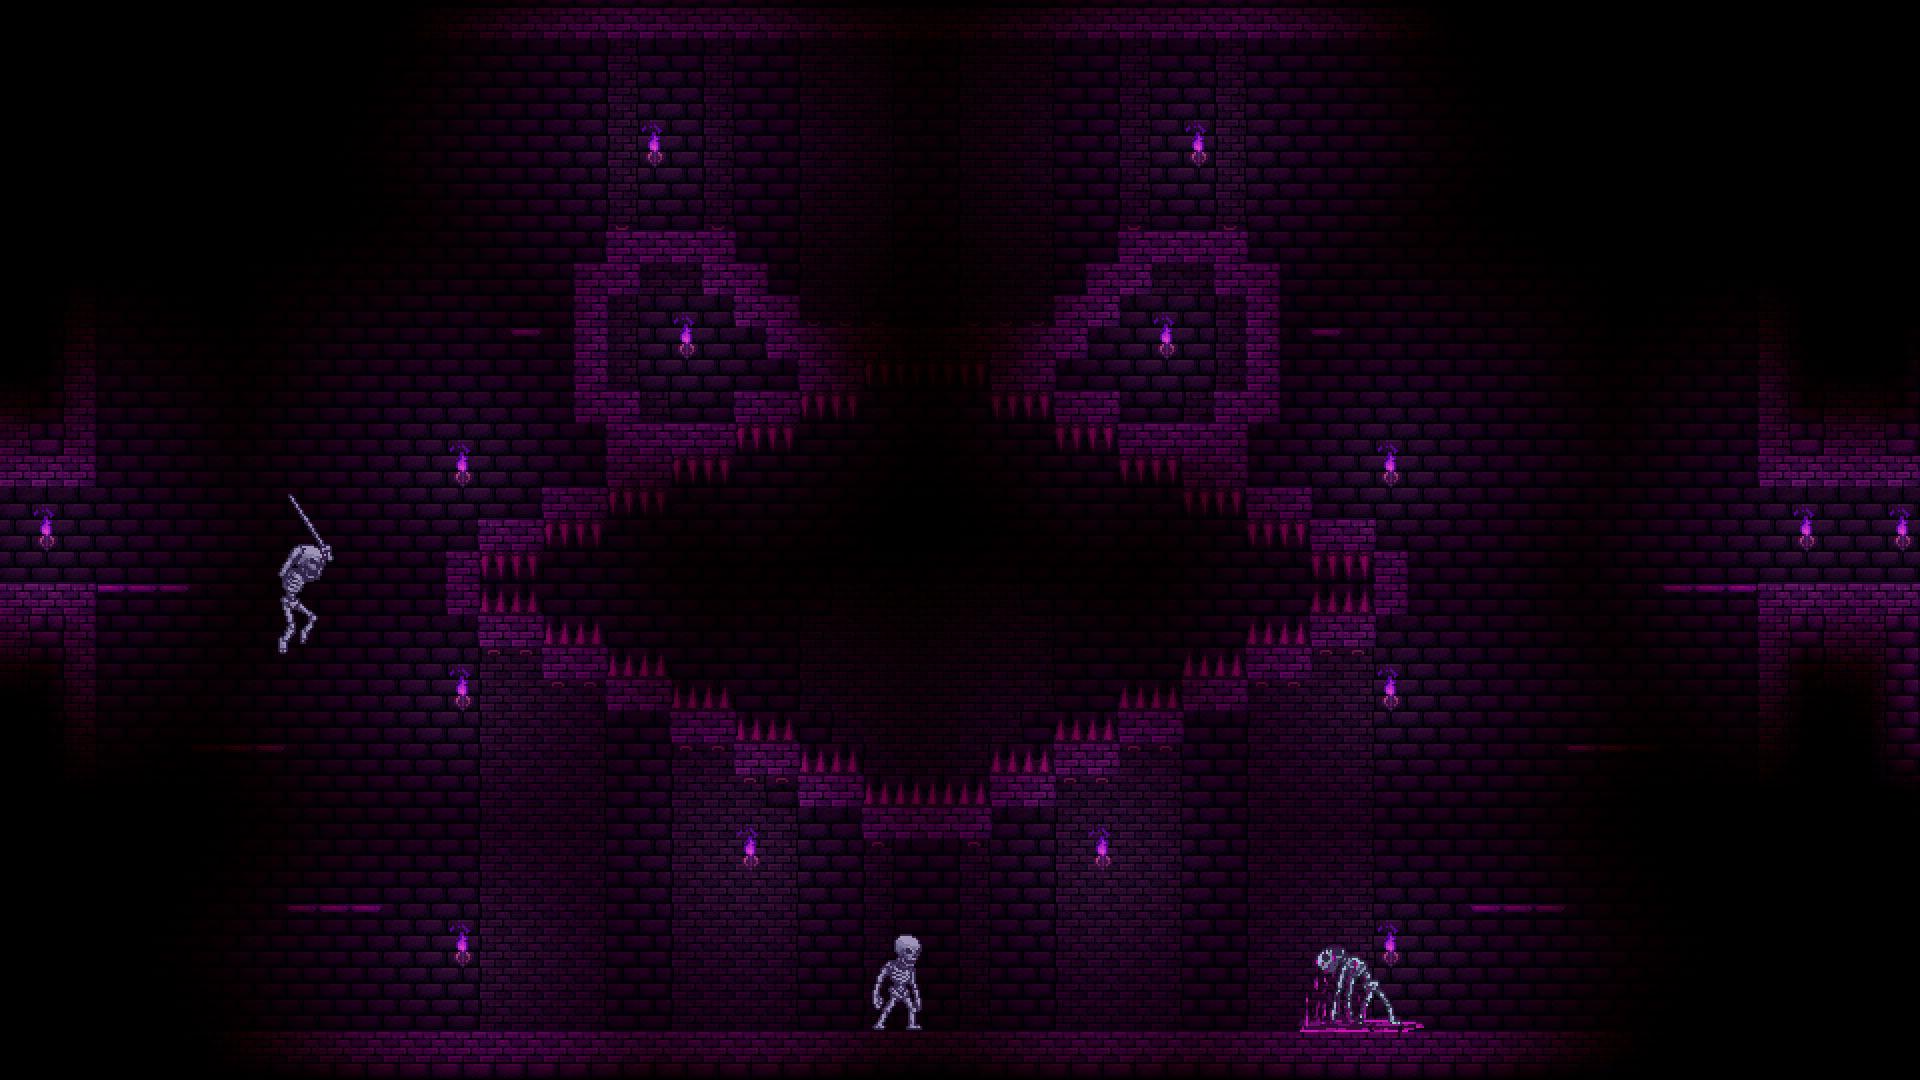 Planet Centauri screenshot